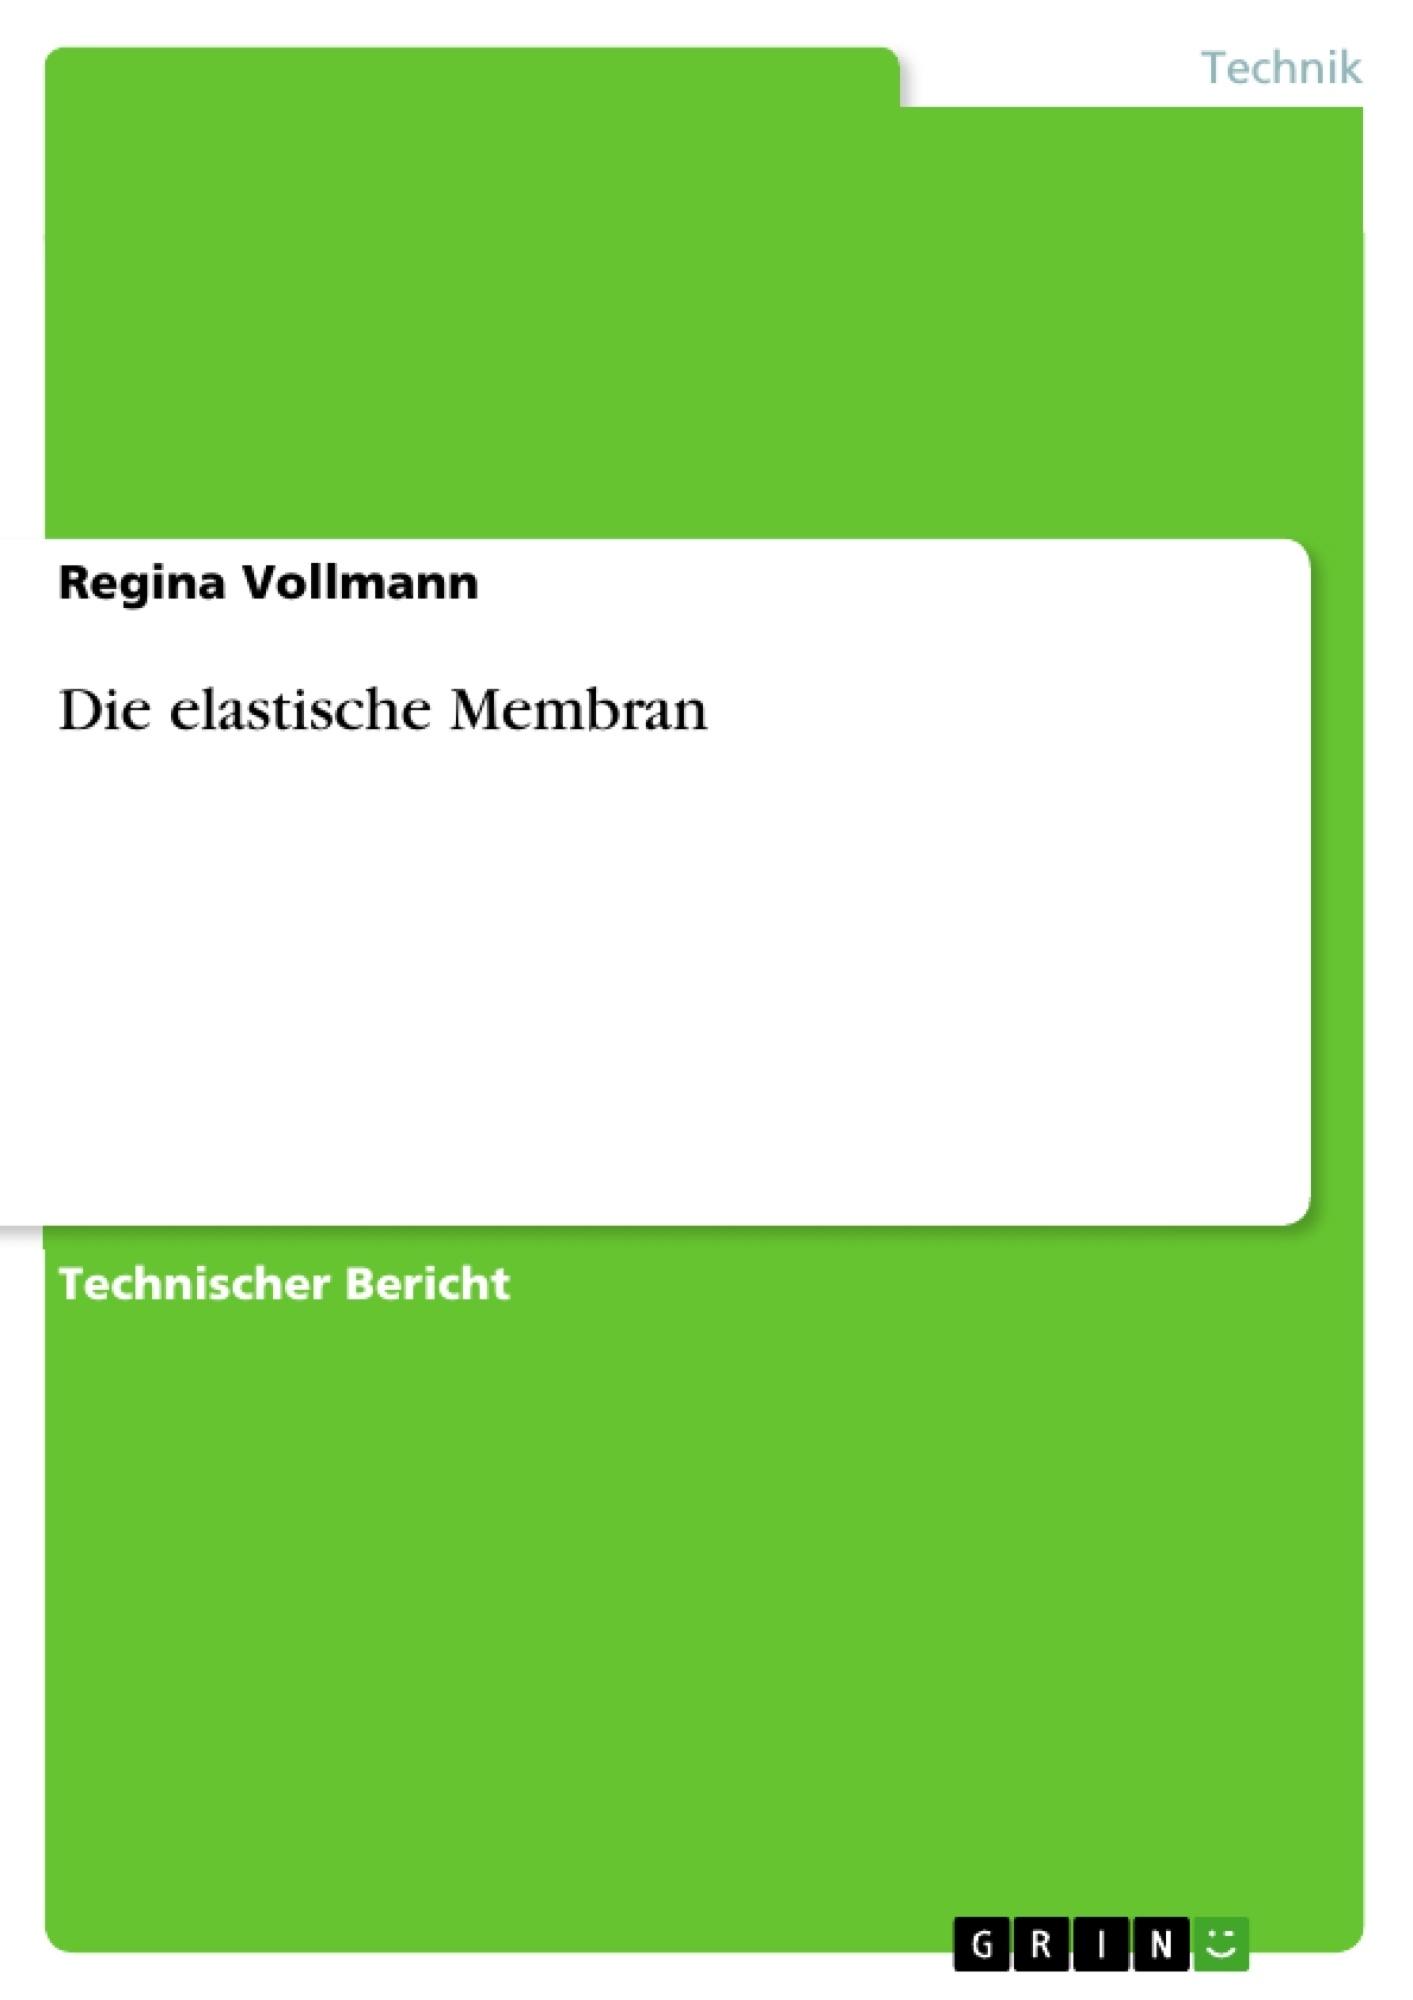 Titel: Die elastische Membran